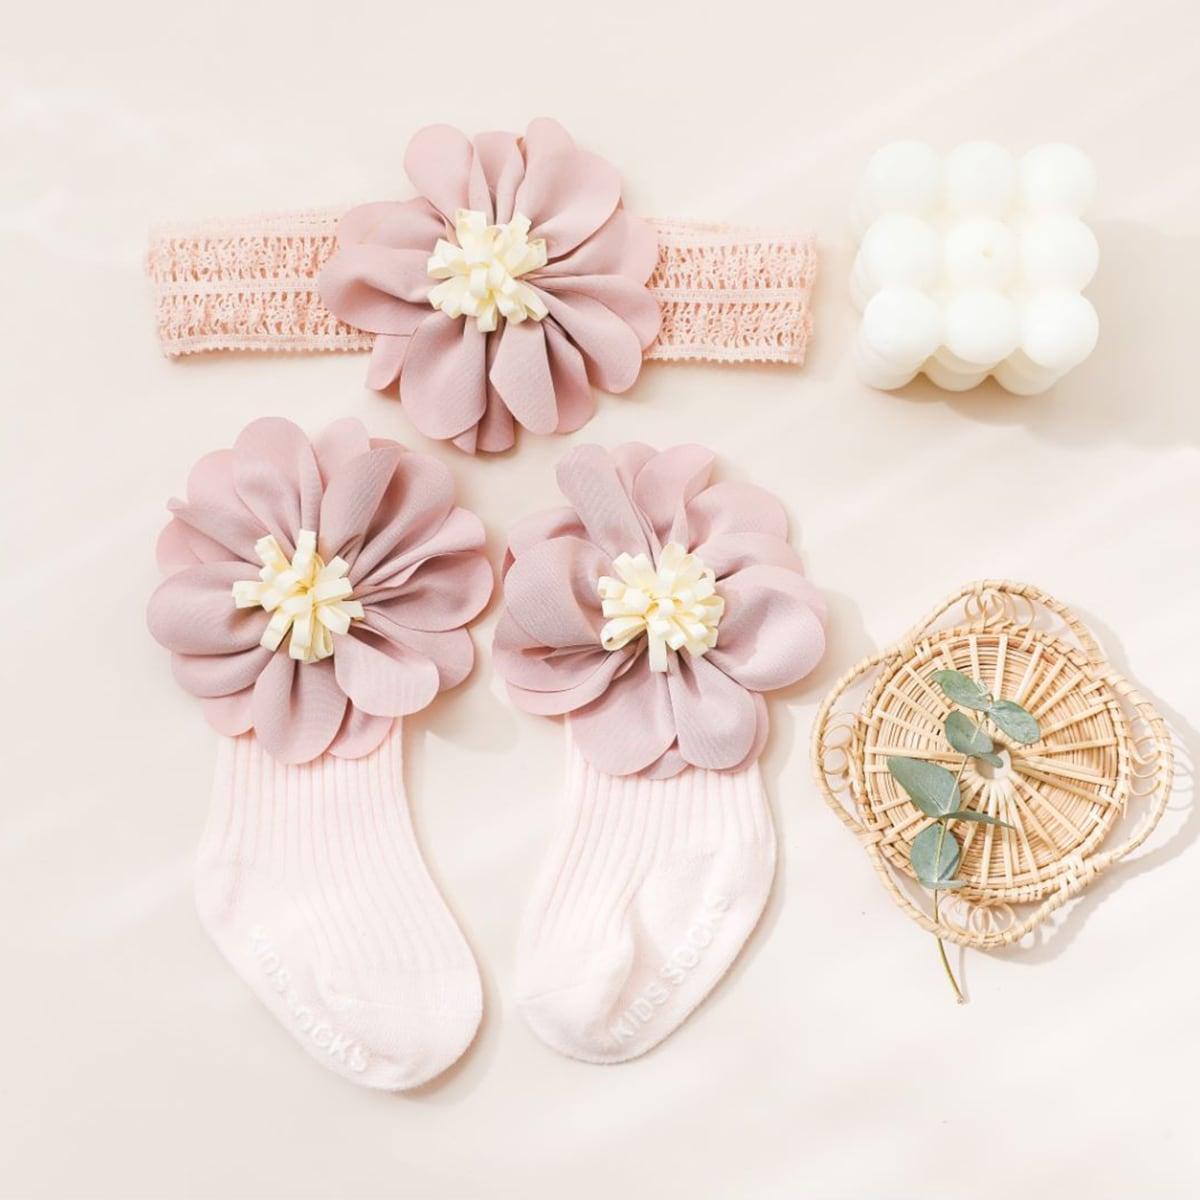 SHEIN / 1pair Baby Flower Decor Socks & 1pc Headband